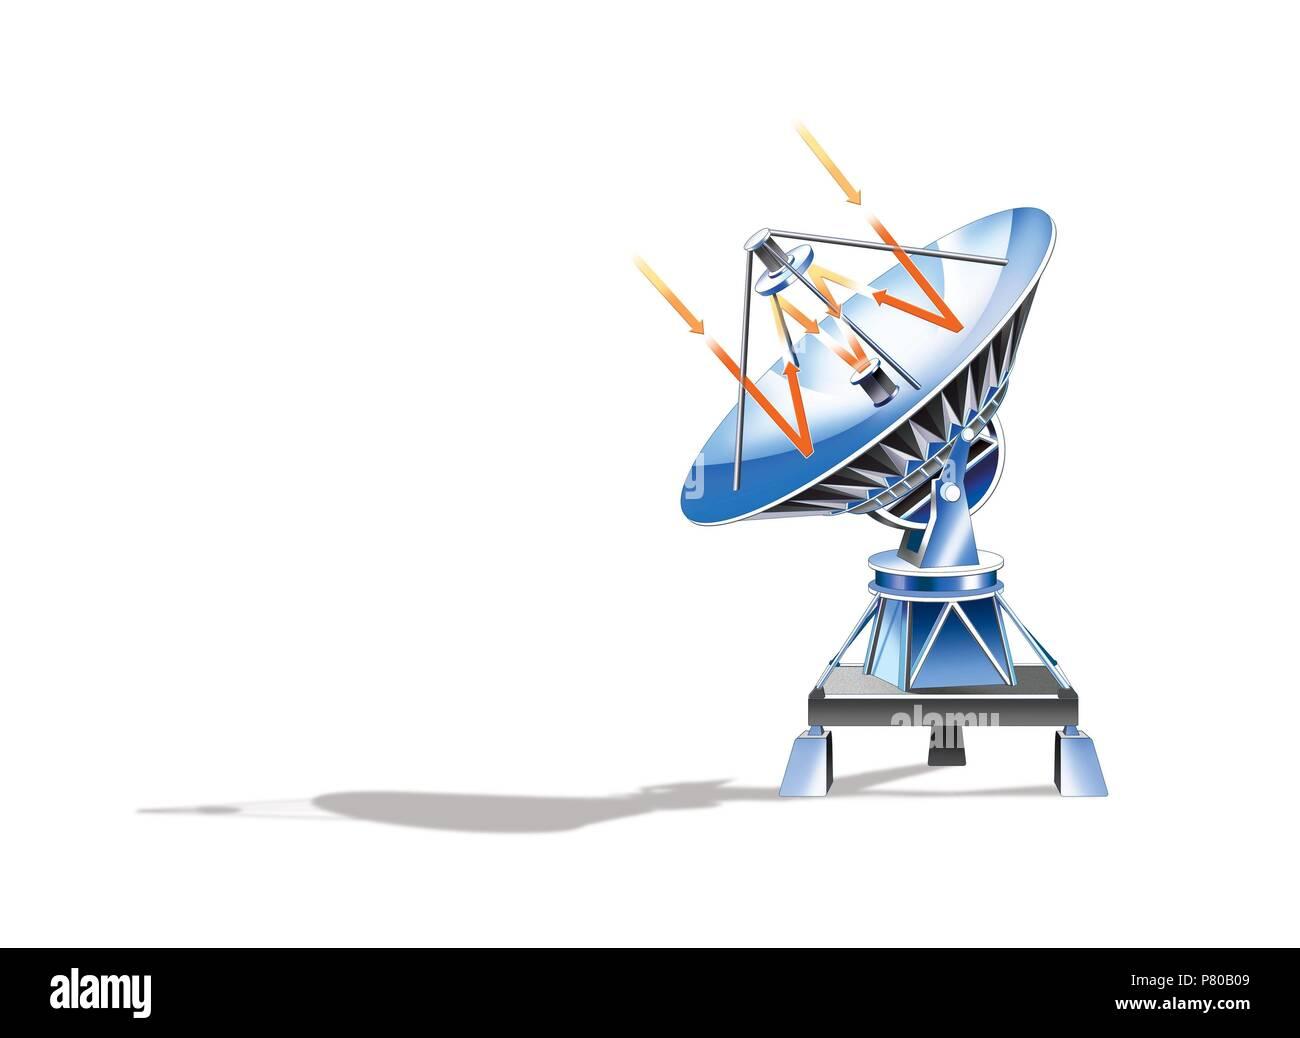 Radio telescope with parabolic antenna.